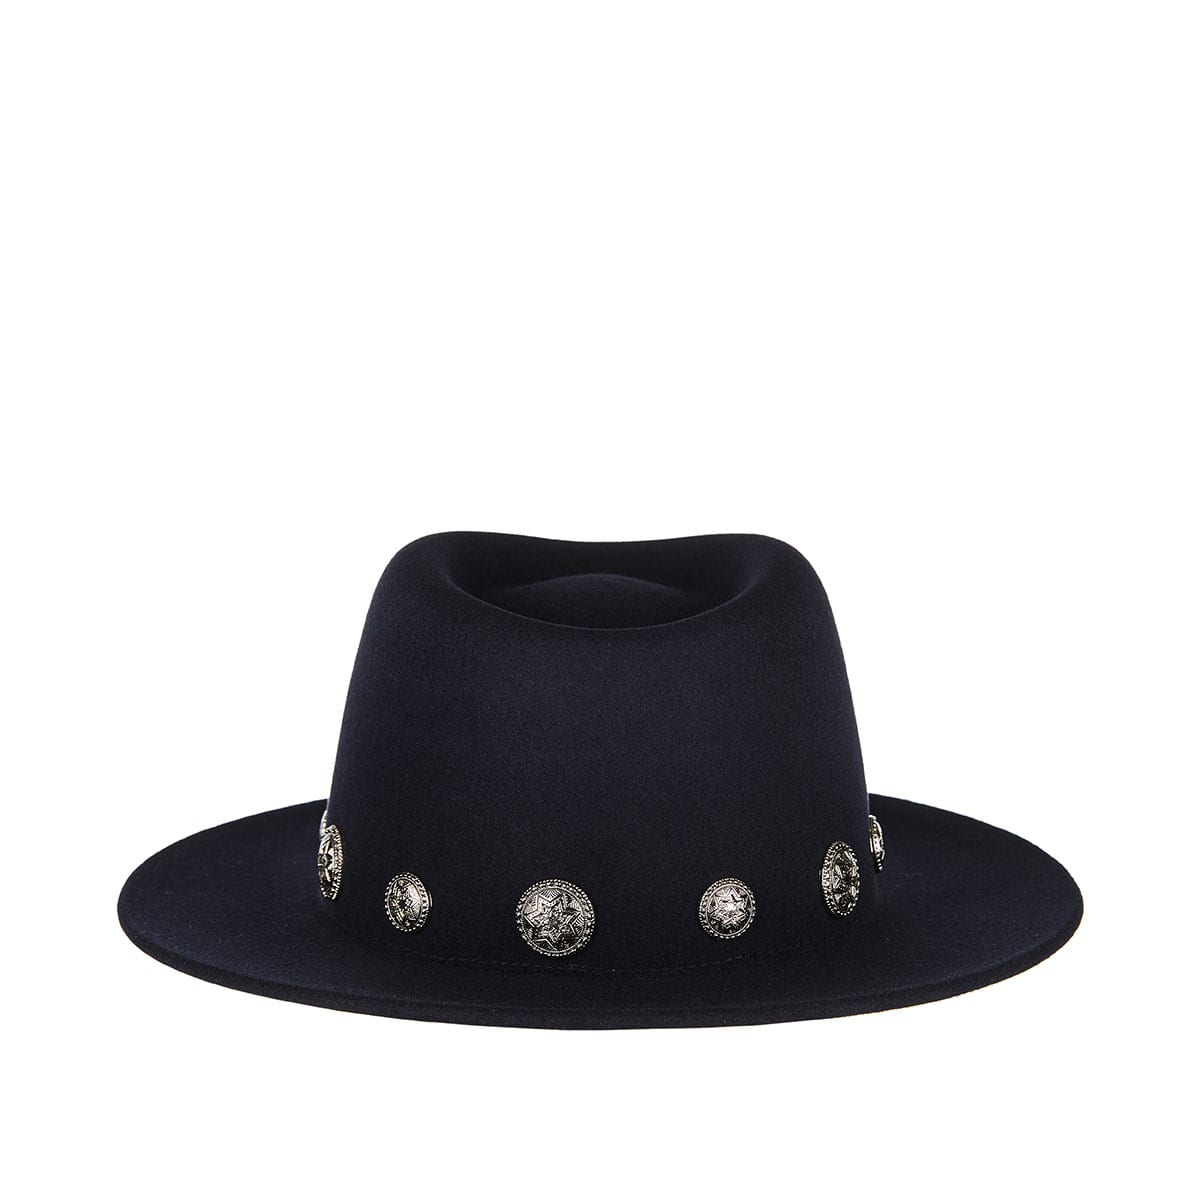 Thadee studded felt hat